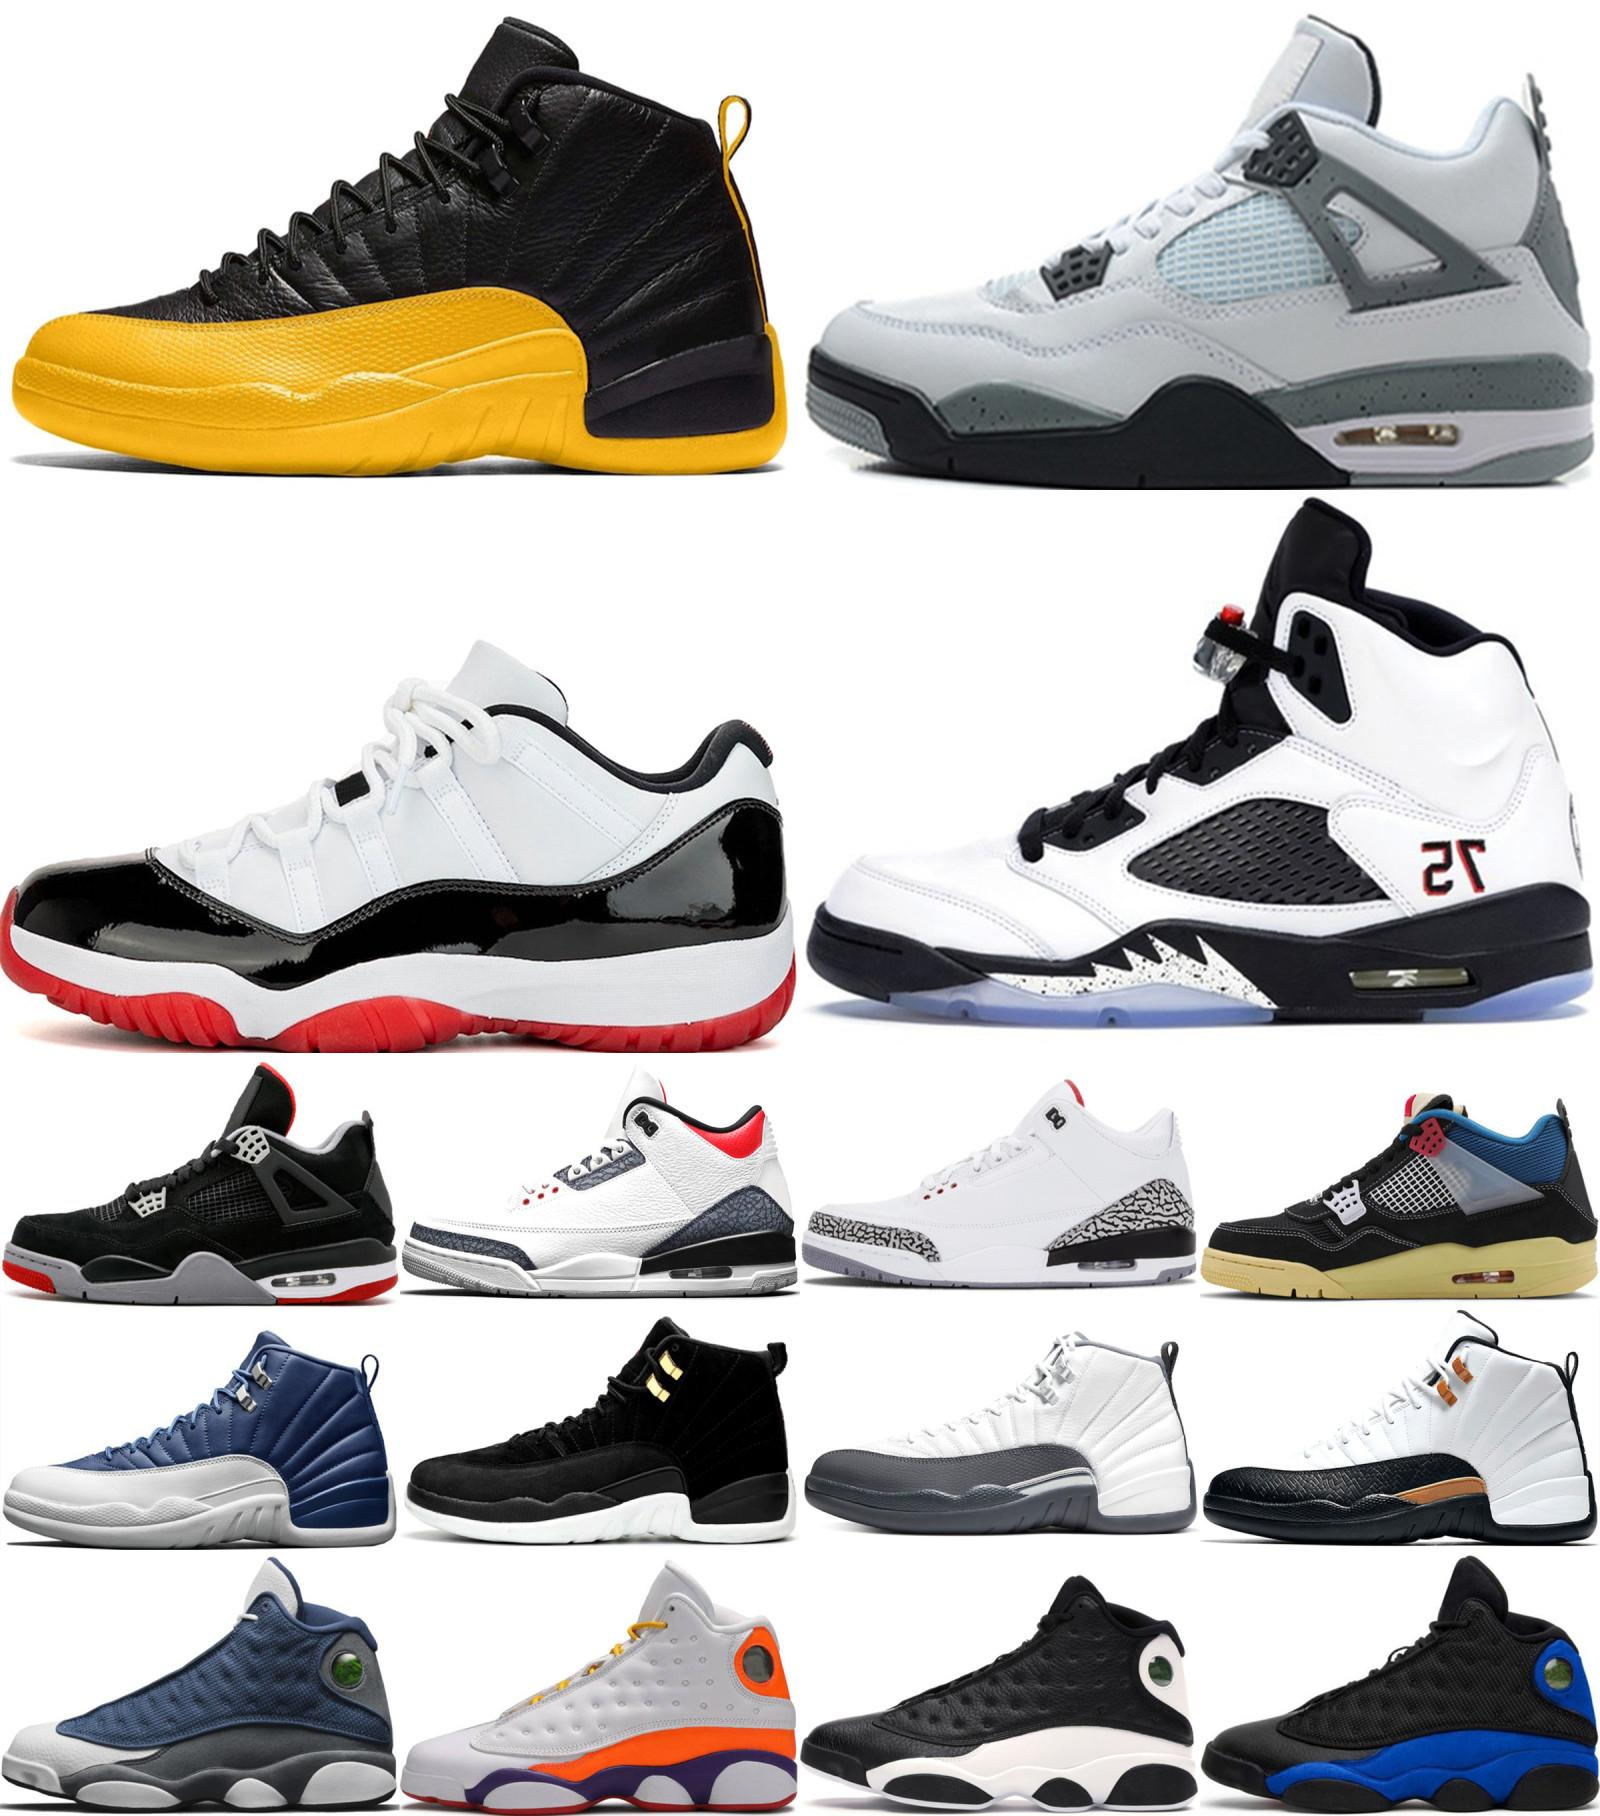 Nike Air Max Retro Jordan Shoes 1S الكلاسيكية 11 13 11S 13S لدت أخمص القدمين أعلى الملكي 3 حطمت اللوحة الخلفية لعبة 12 5 4 شيكاغو المالكة أحذية الرجال النساء لكرة السلة